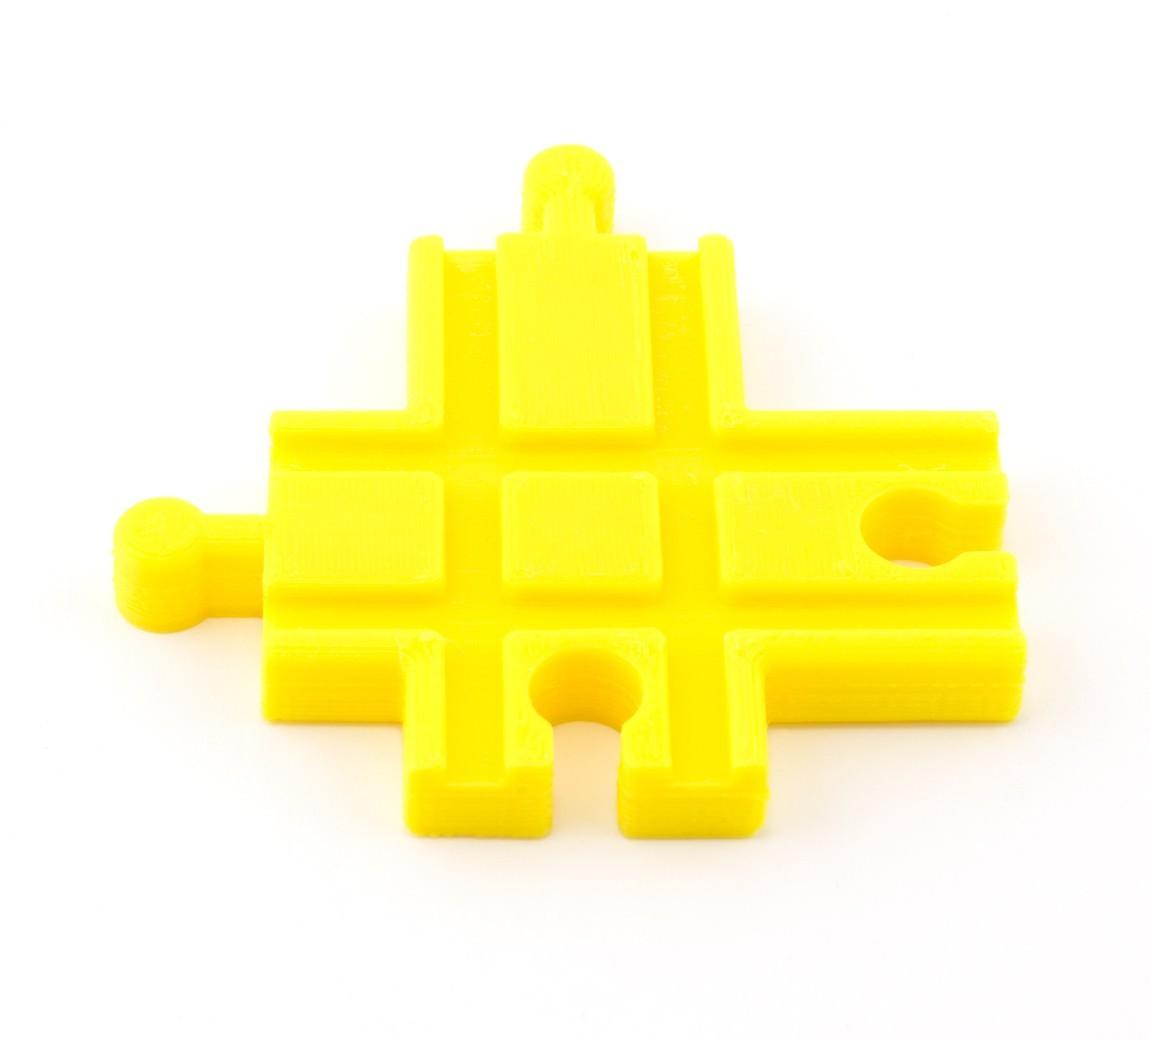 91cb4f62ceb4627f4039d91b0e40adb8_1449686684759_12.2.15-product-shoot-133.jpg Download free STL file Toy Train Tracks • 3D printer design, FerryTeacher